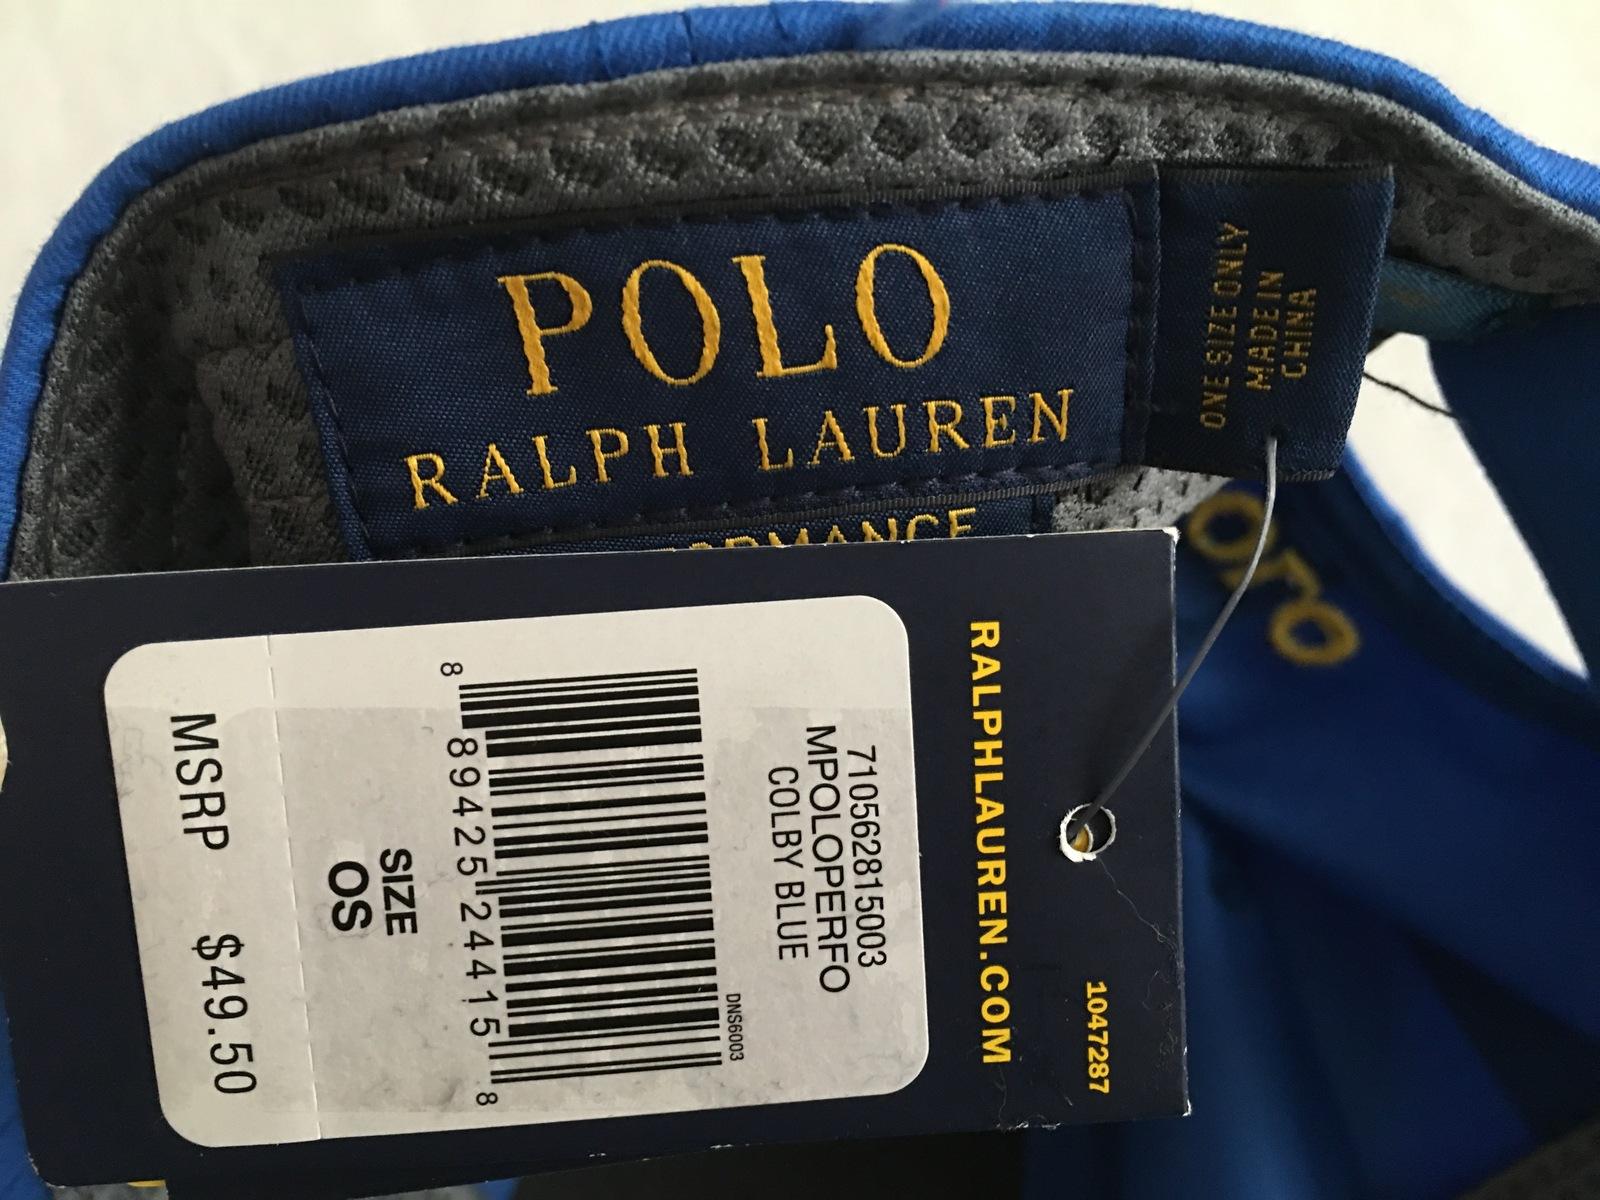 4a4bee289a0d9f NWT Polo Ralph Lauren Men's Performance Baseline Baseball Cap One Size Fits  All